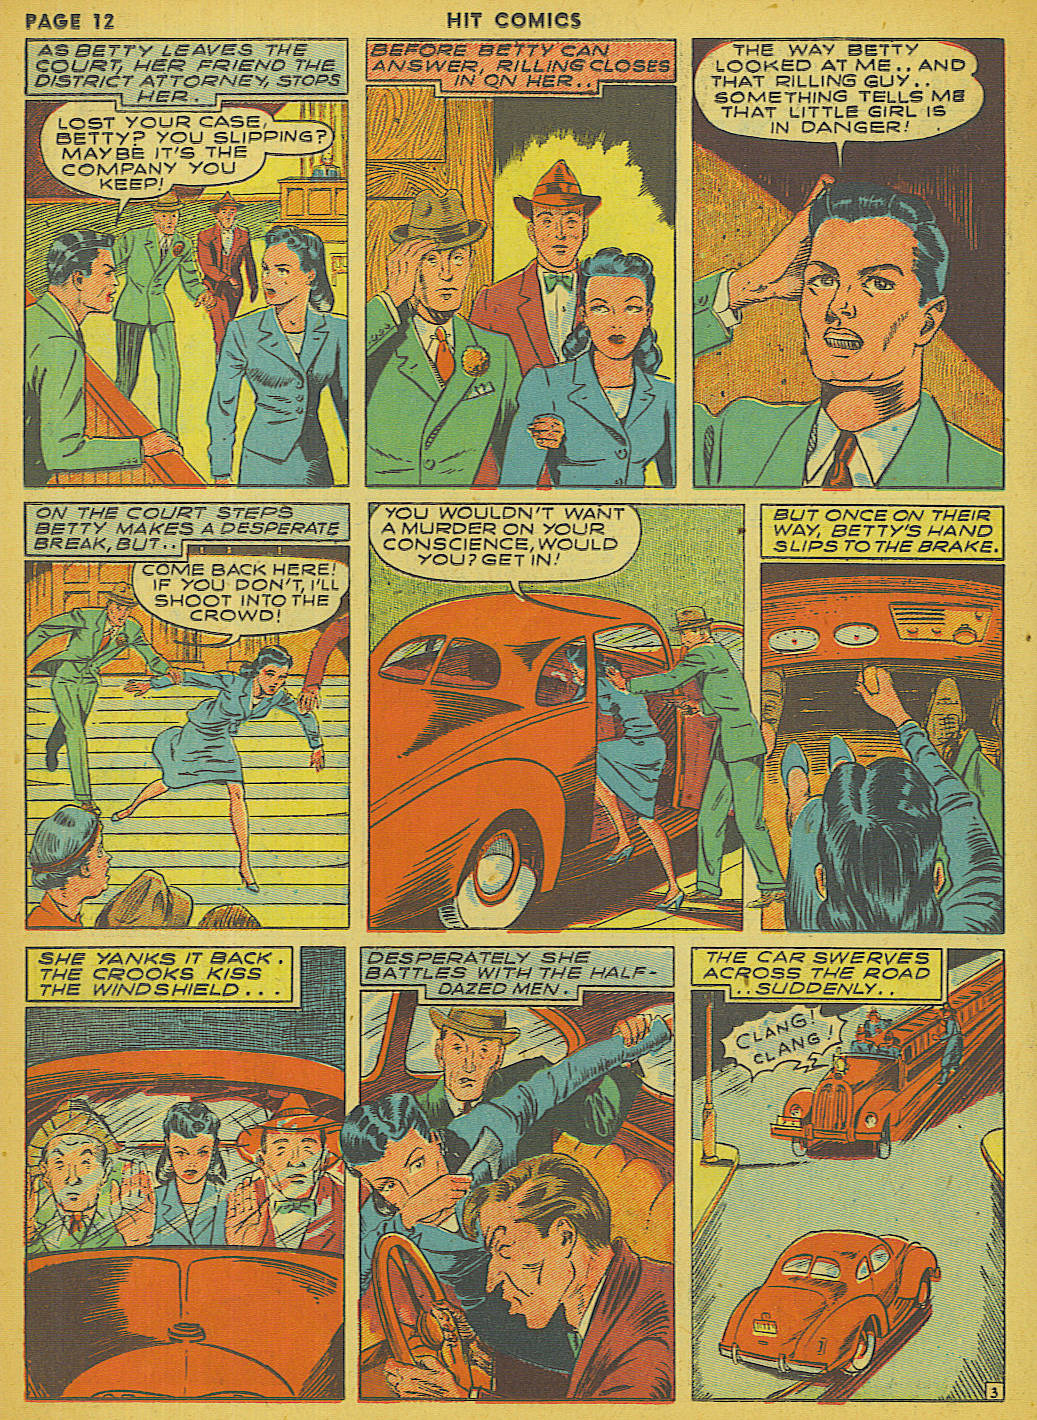 Read online Hit Comics comic -  Issue #13 - 14